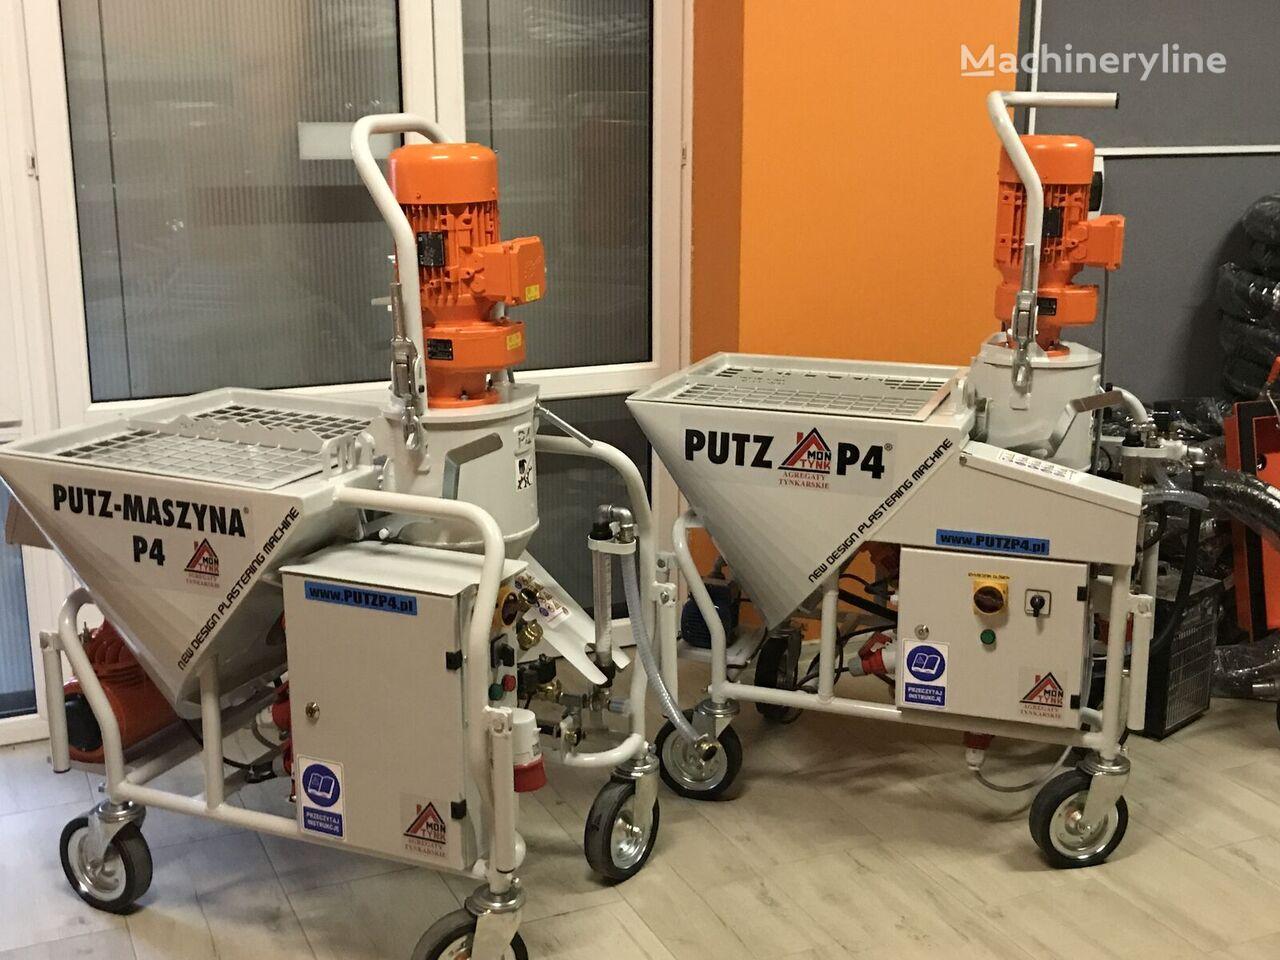 new Agregat tynkarski ,Putzmaschine P4 ,vakológép ,strojova omietack plastering machine